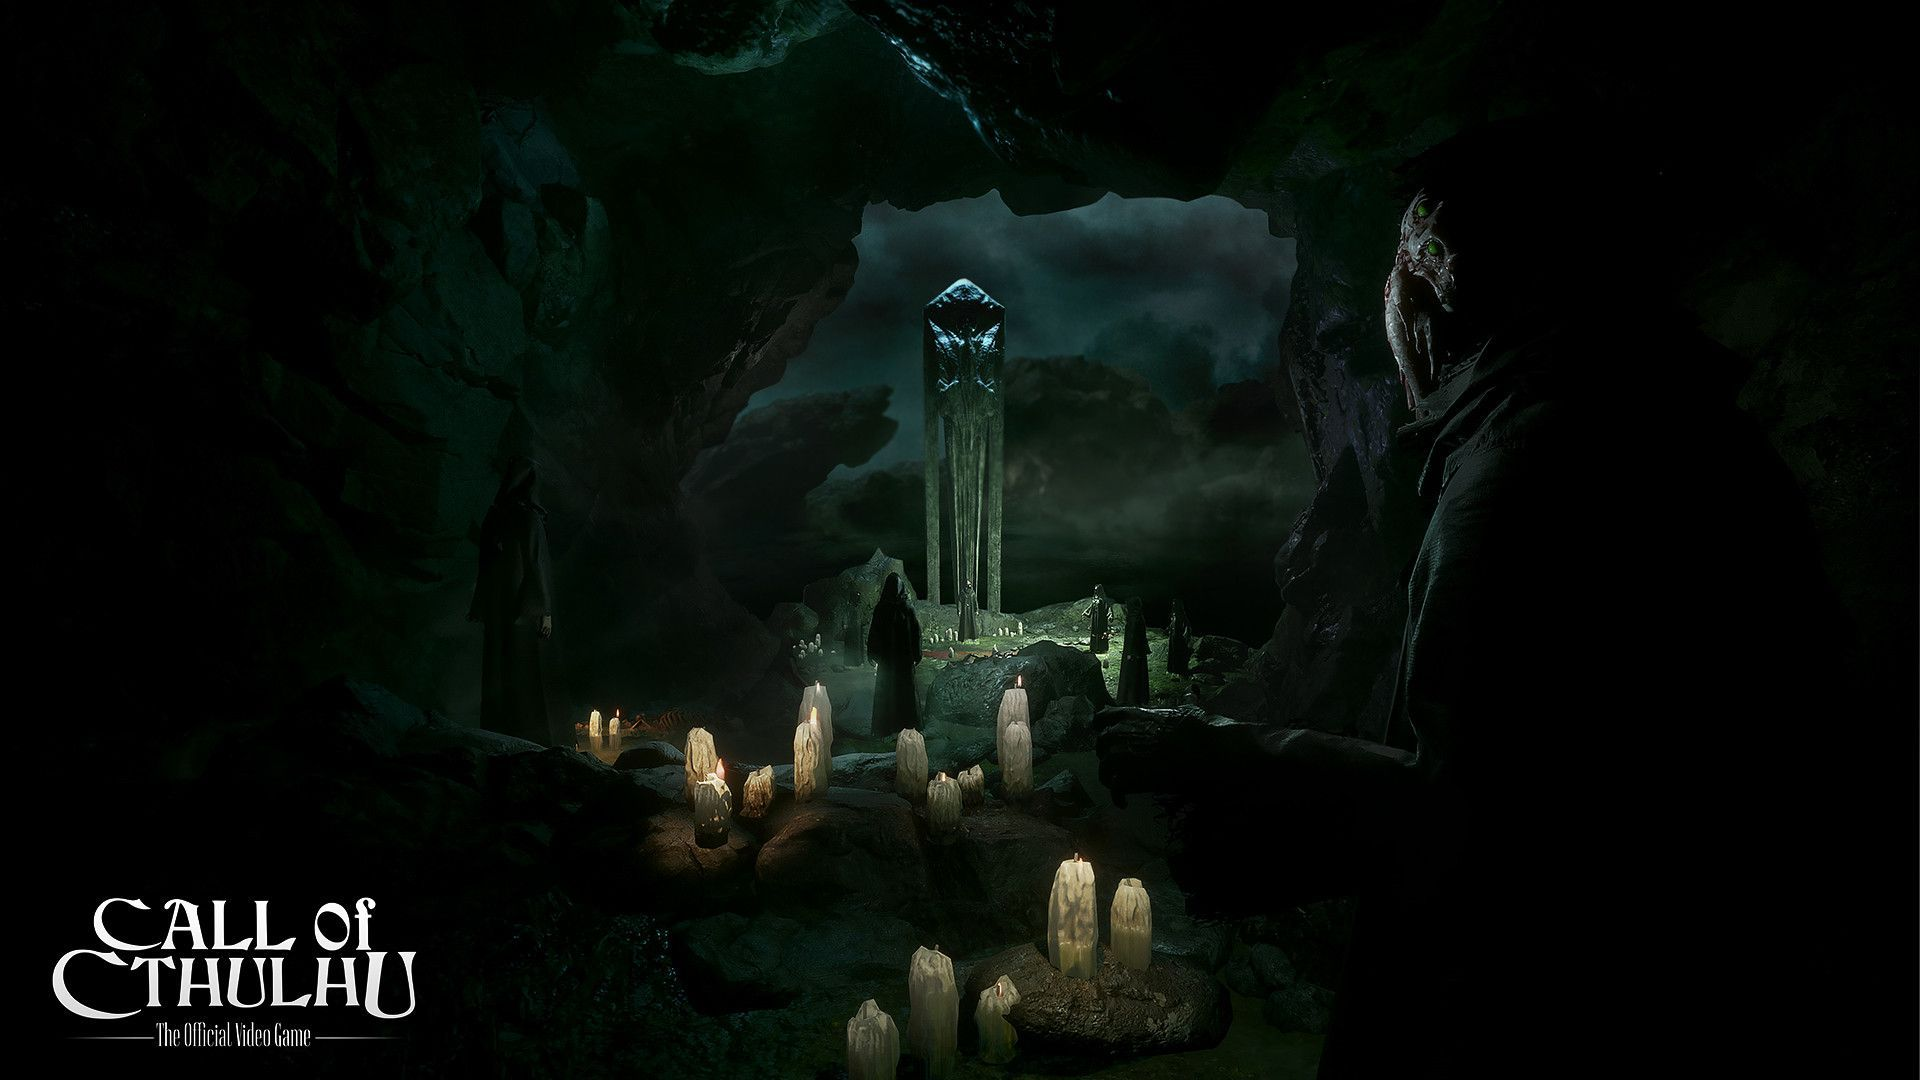 В Steam уточнили дату выхода ужастика Call of Cthulhu